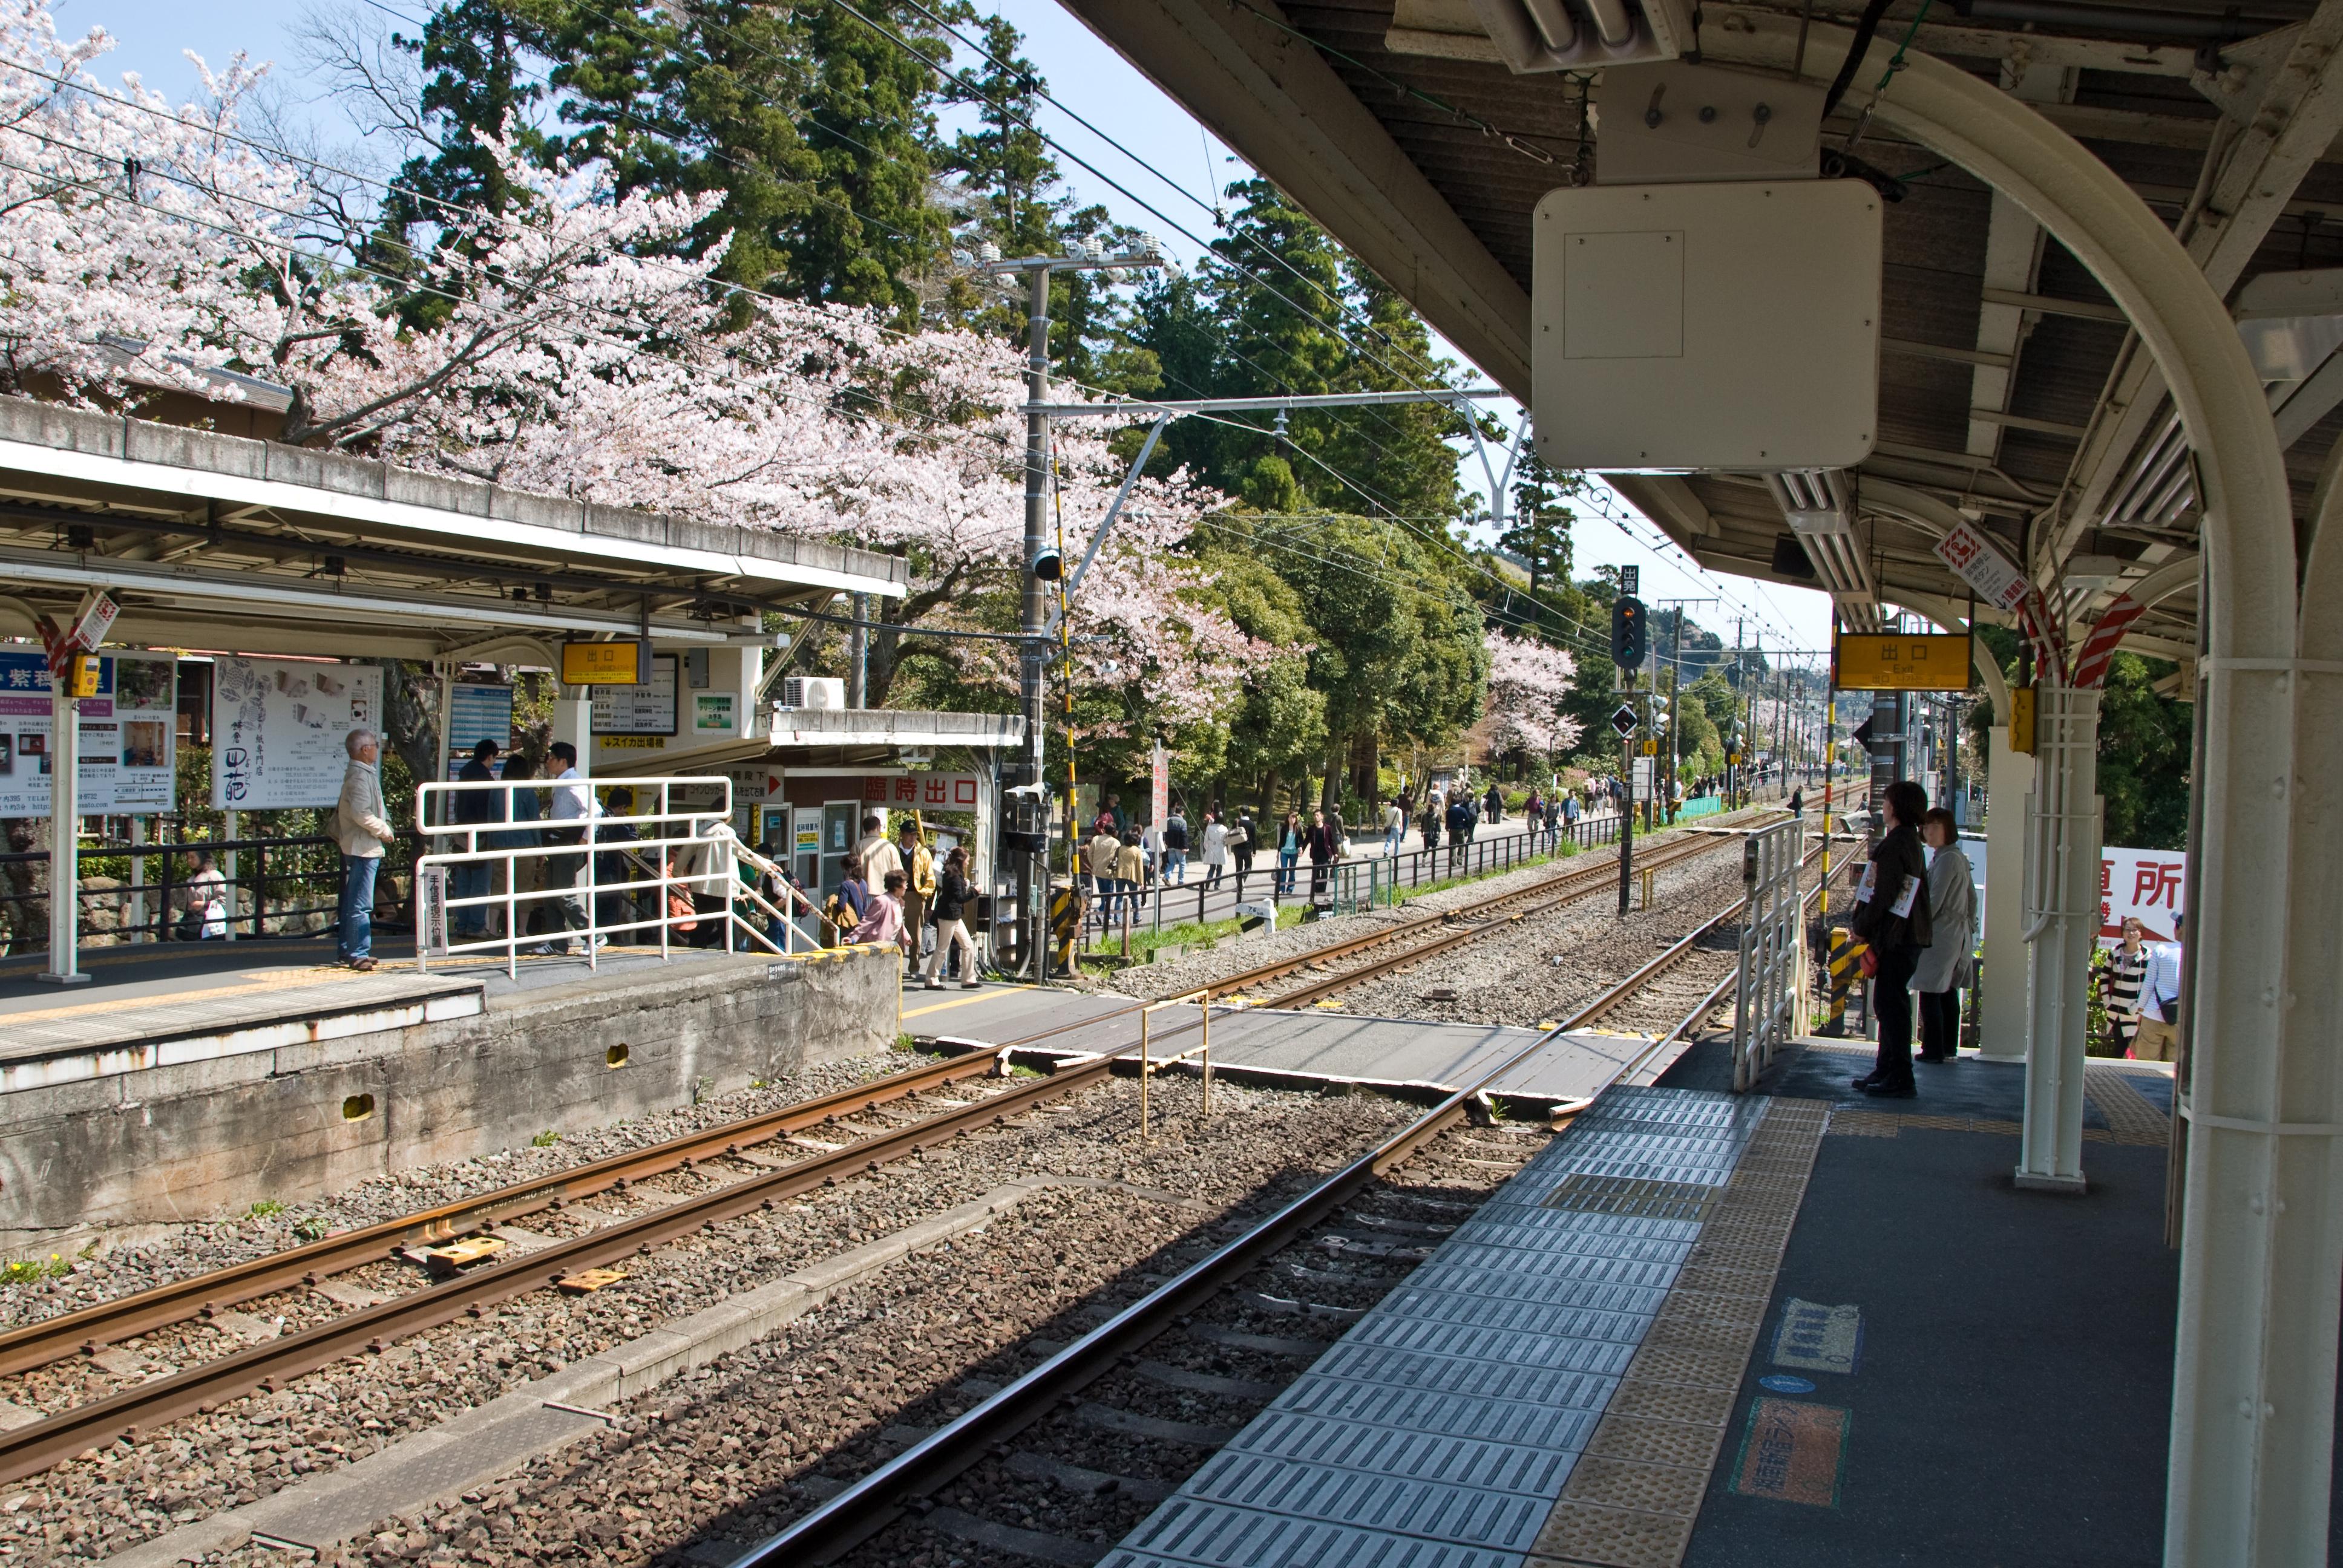 https://upload.wikimedia.org/wikipedia/commons/6/6d/Kita-Kamakura_Station.jpg